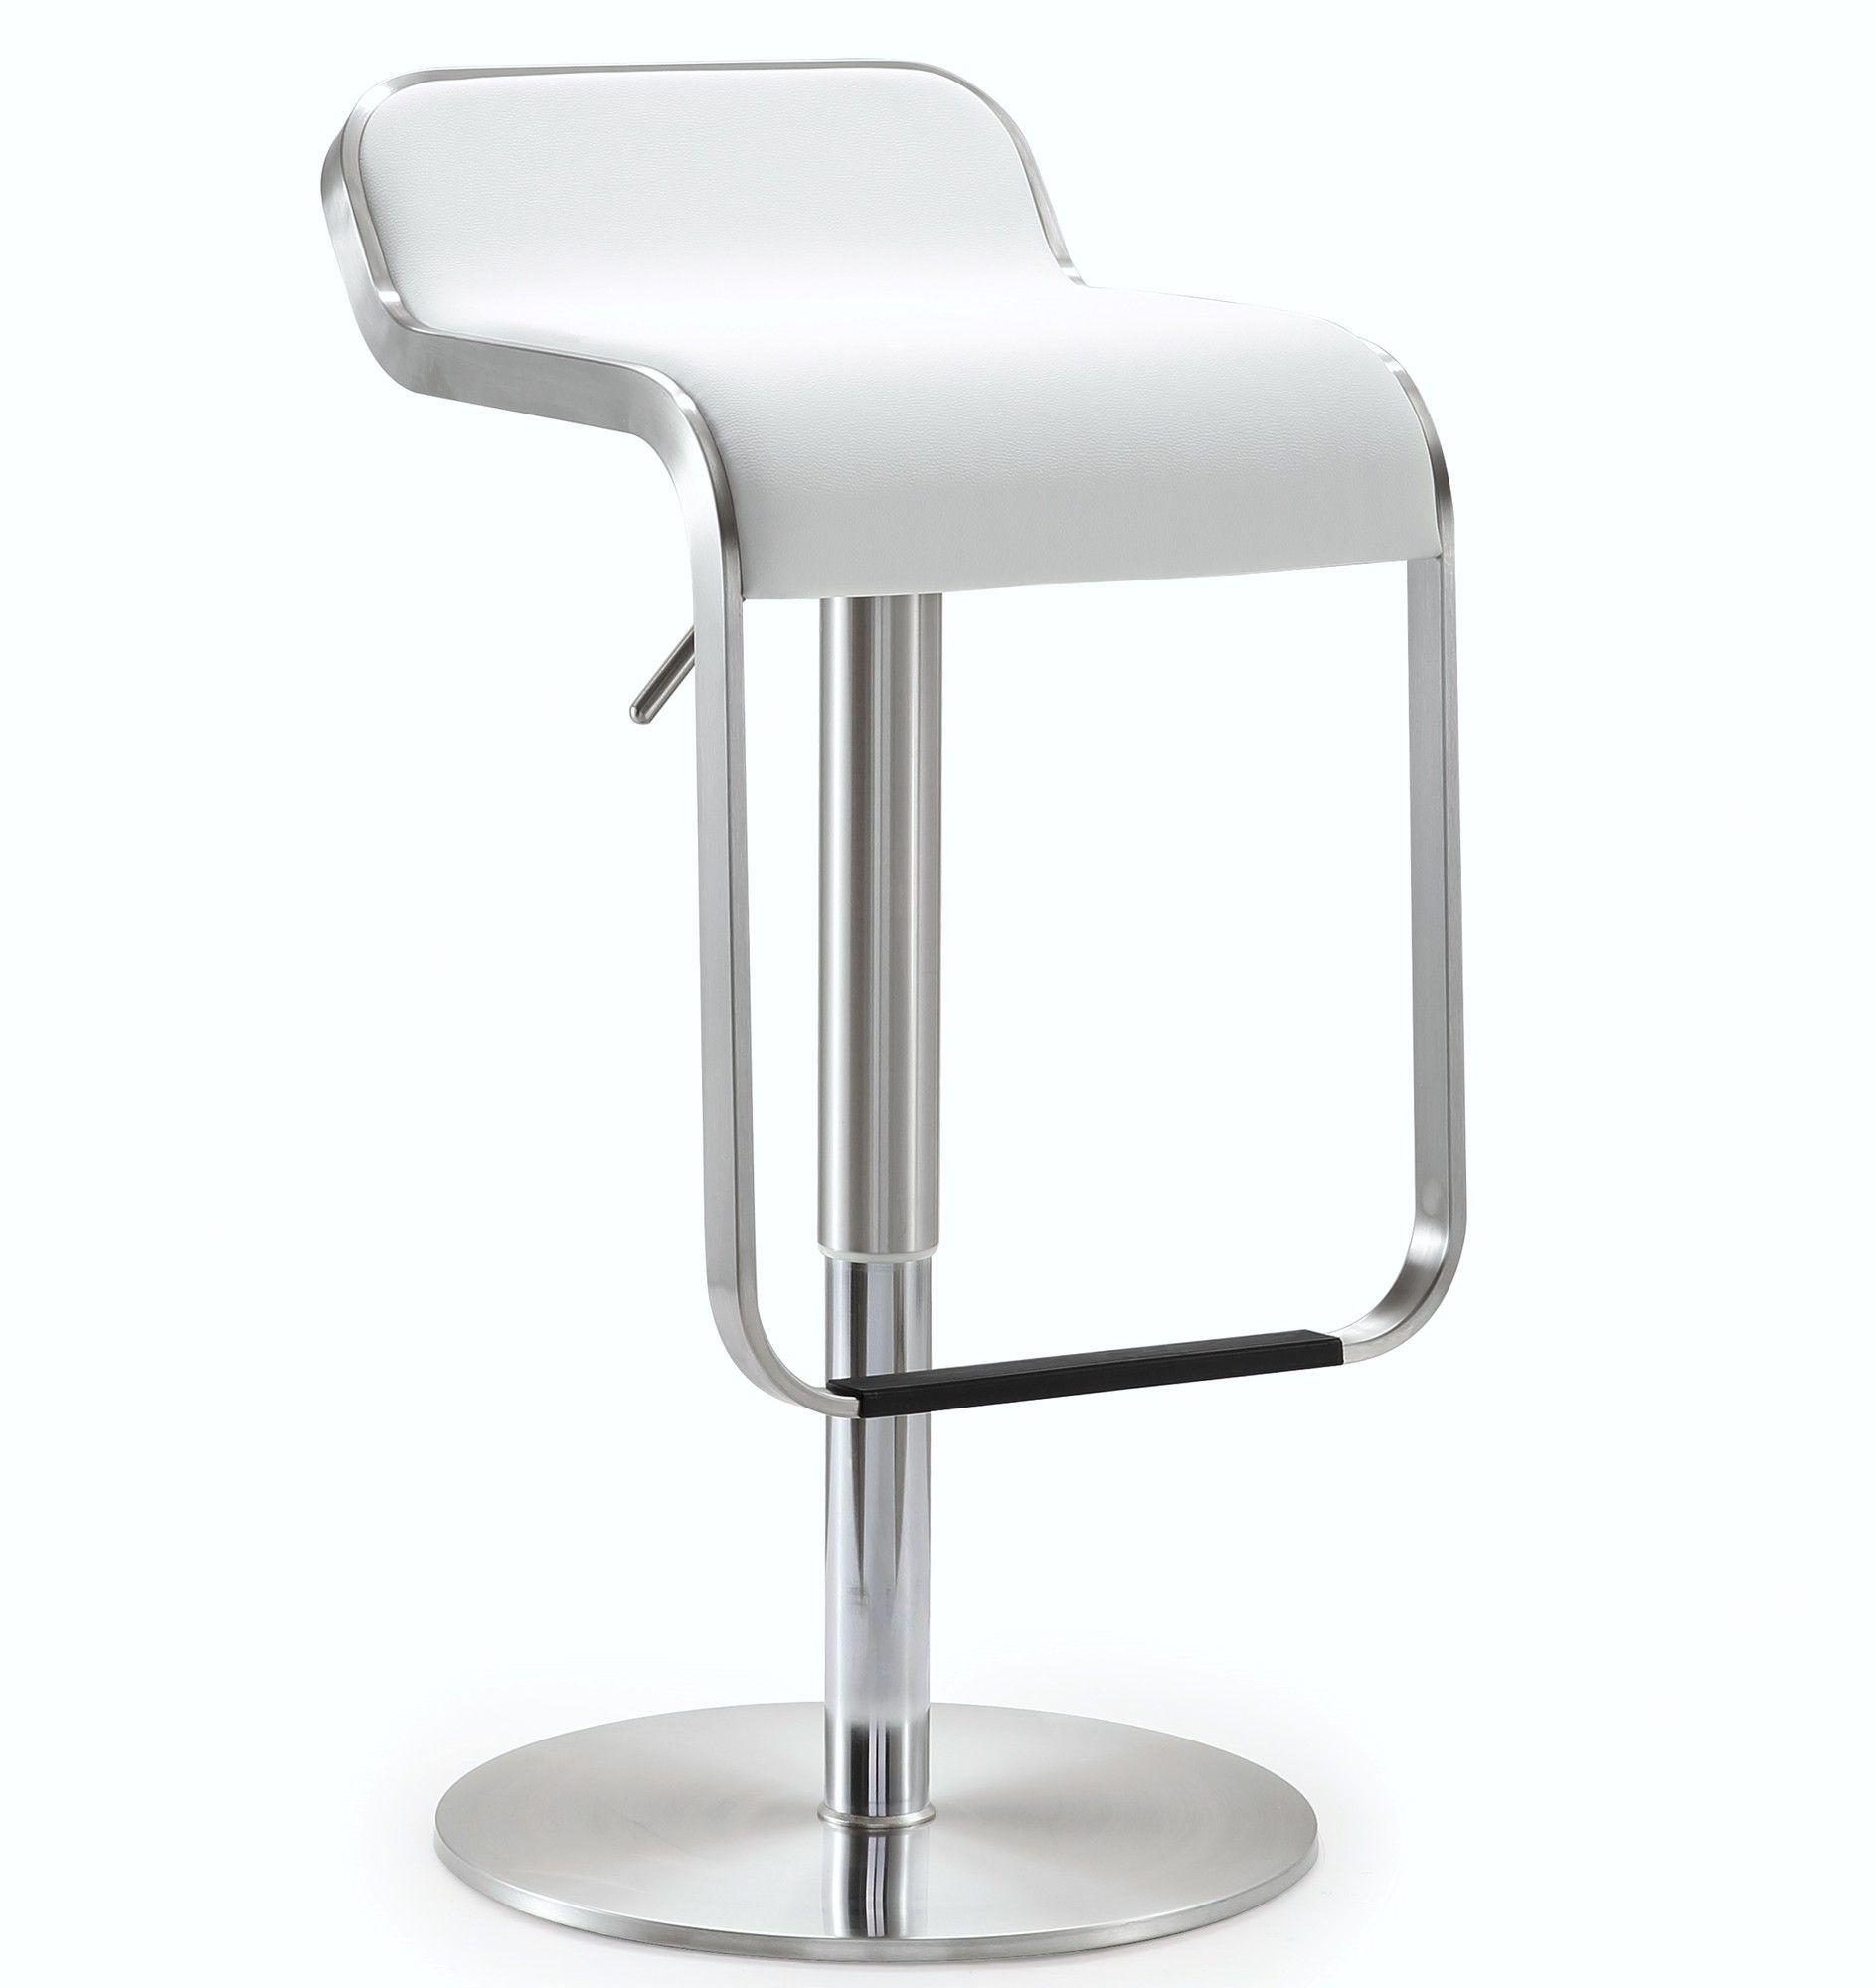 Tov Napoli Adjustable Height Swivel Bar Stool With Cushion Ruang Makan